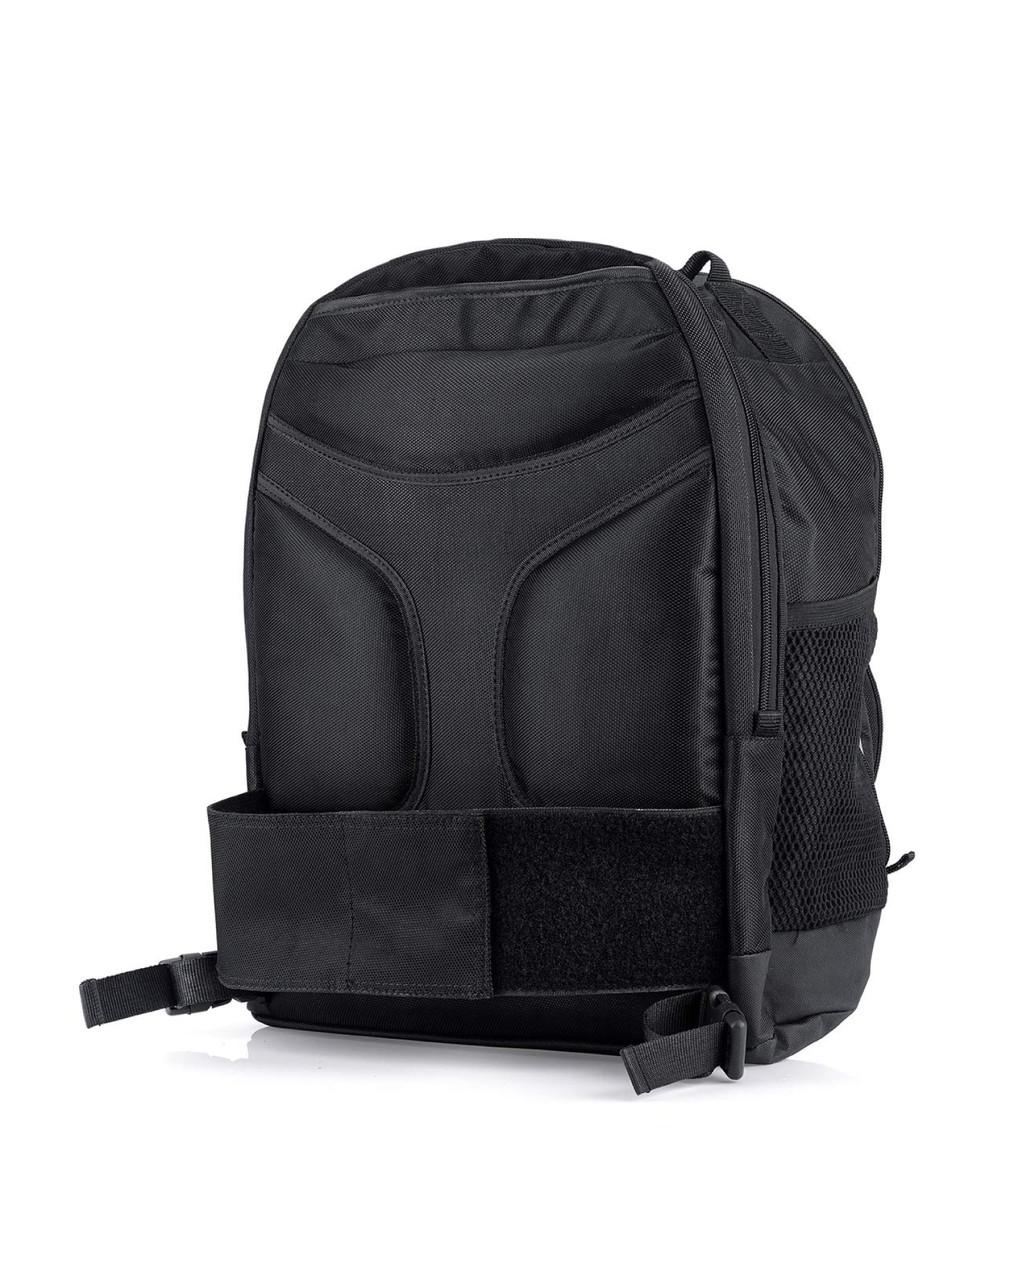 Viking Medium Black Street/Sportbike Sissy Bar Backpack Back Side View